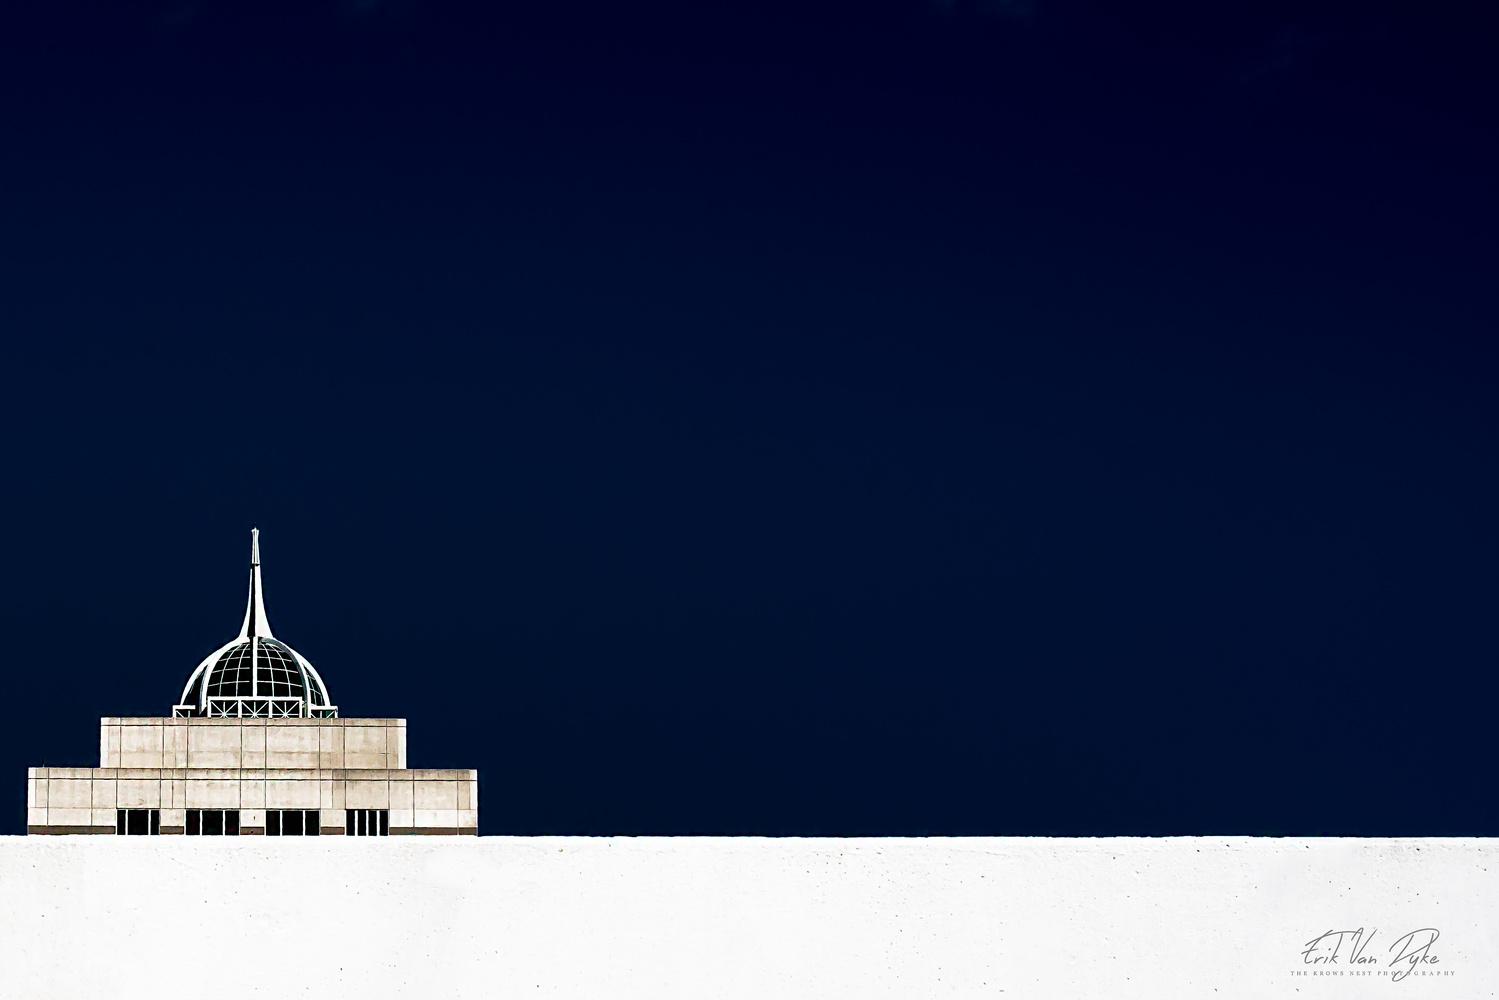 Albany NY - Minimalism by Erik Van Dyke